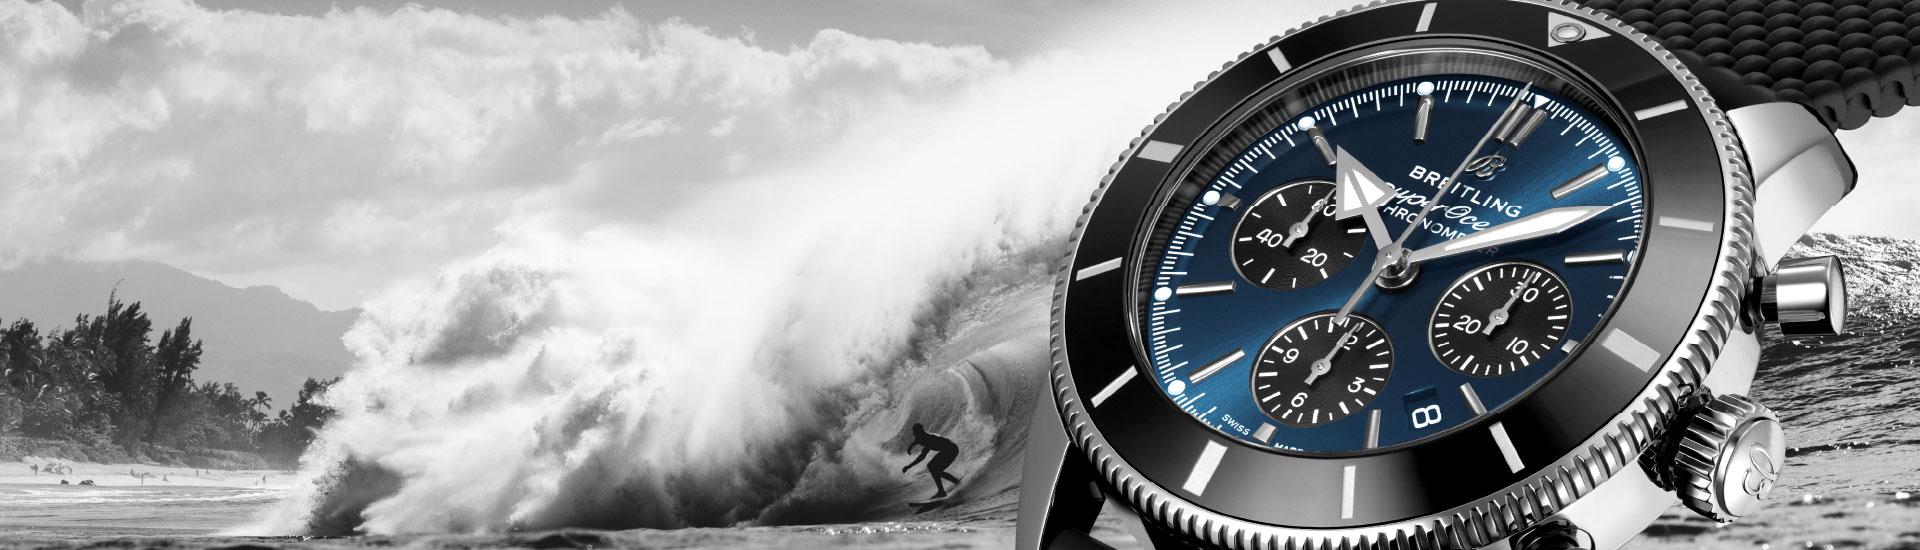 Breitling Superocean Heritag Kollektion